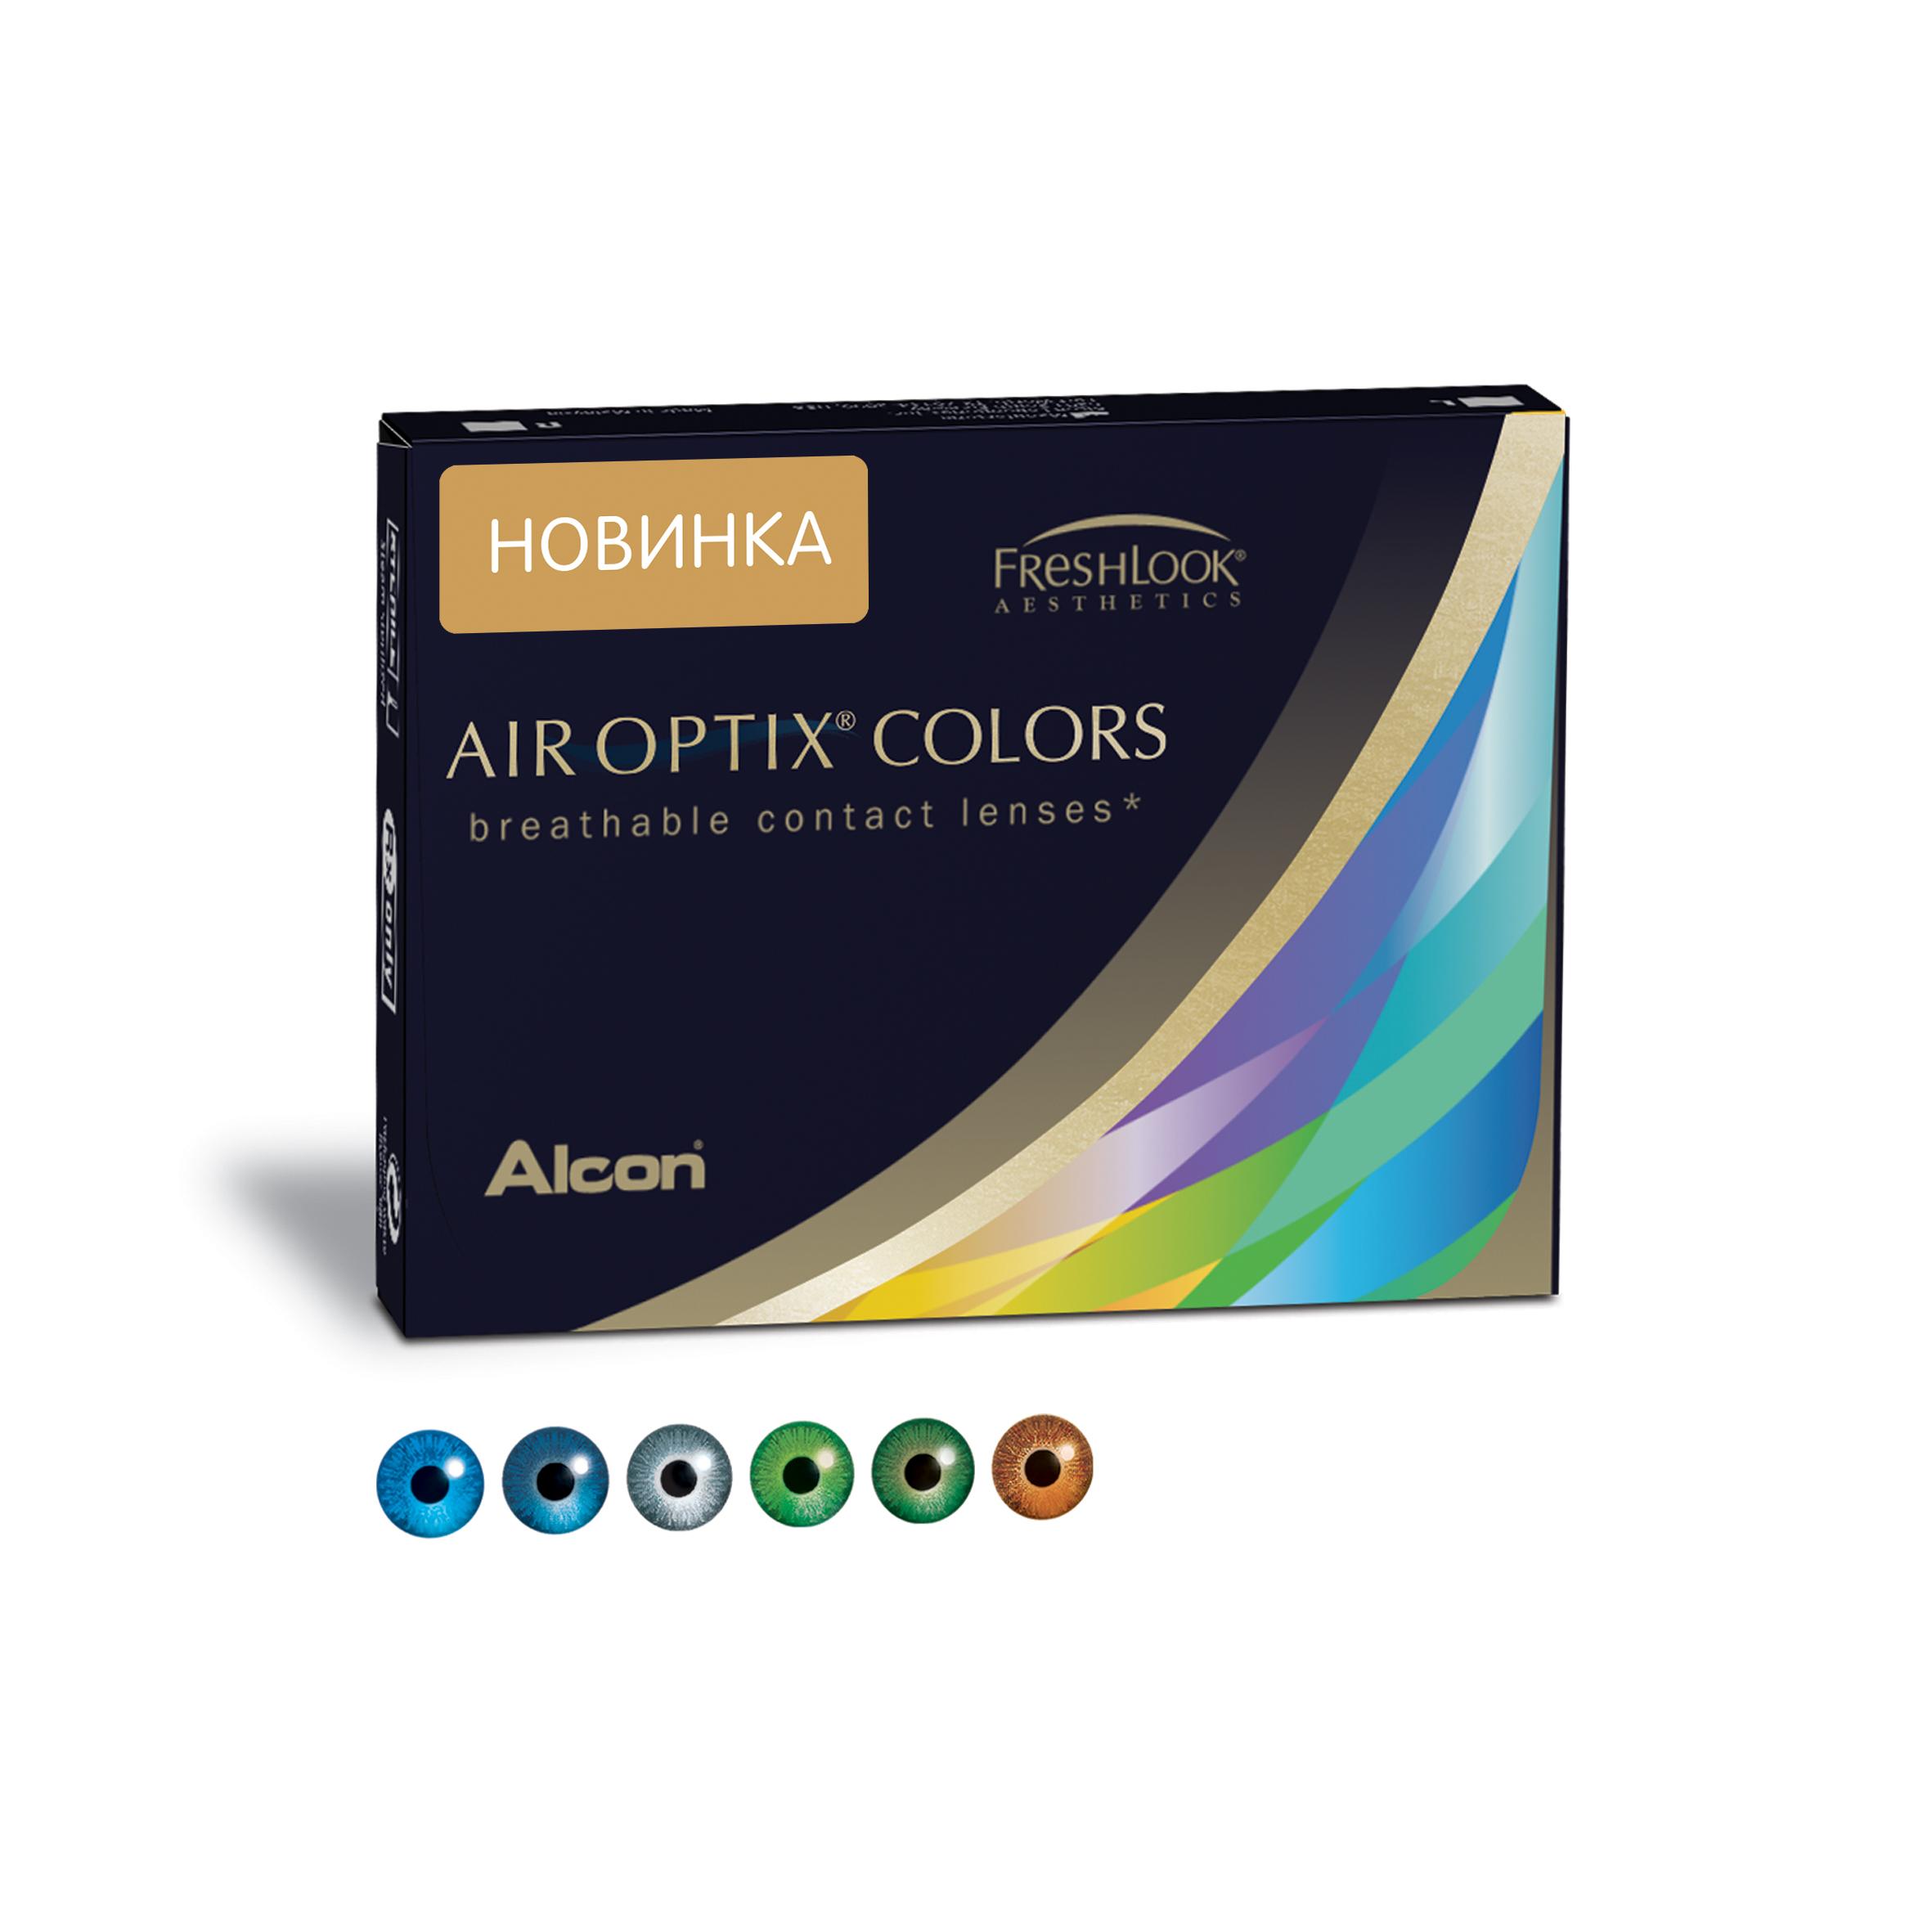 Аlcon контактные линзы Air Optix Colors 2 шт -6.00 Green31746306Мягкие контактные линзы